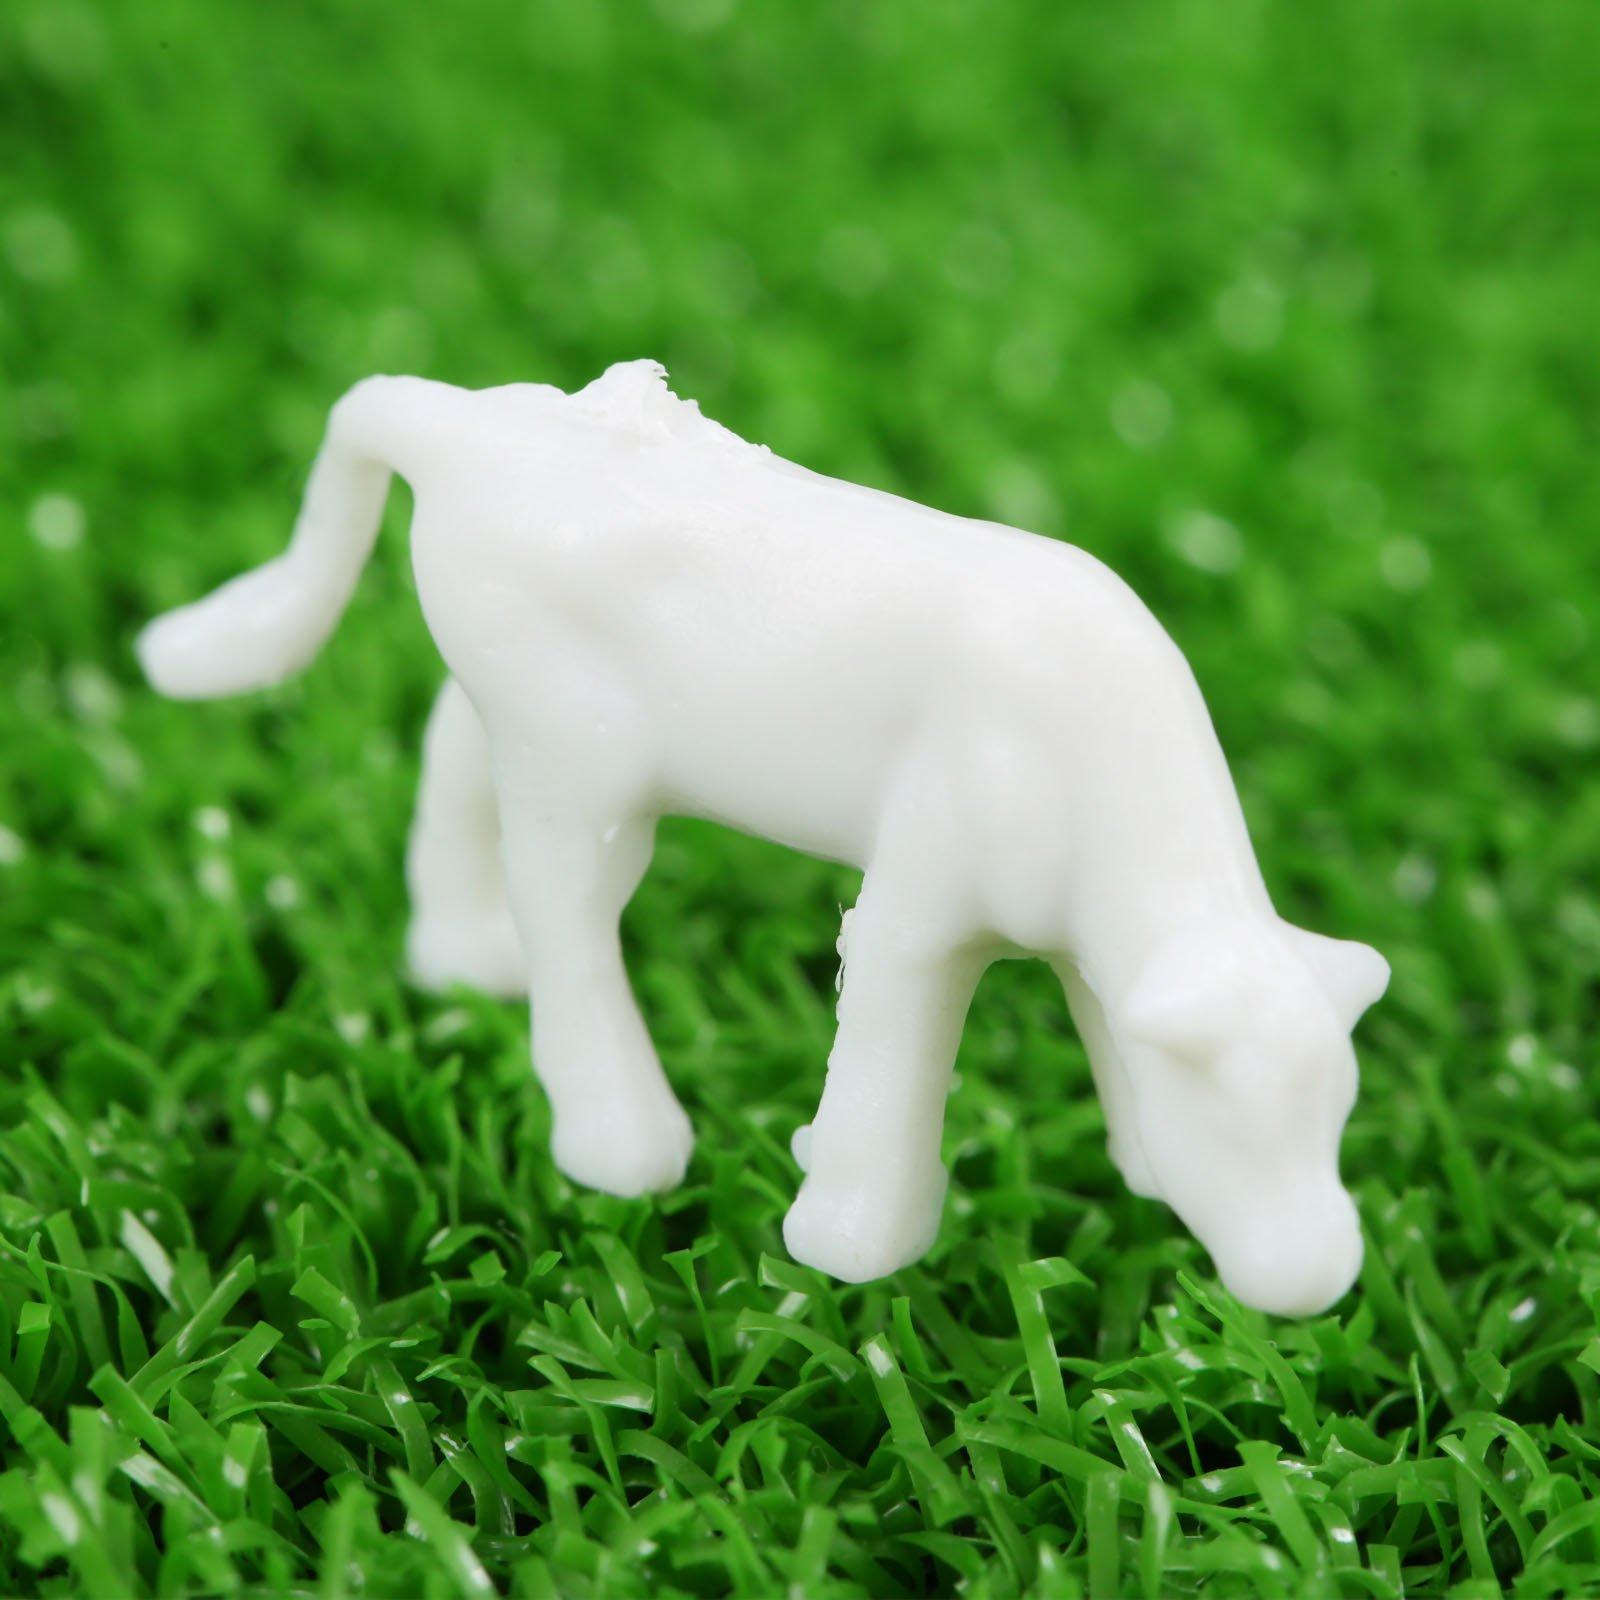 100pcs 1:150 Mixed Stowage White Horse H-13mm Scale Figure Plastic DIY Model Farm Animal Models Toy Set White